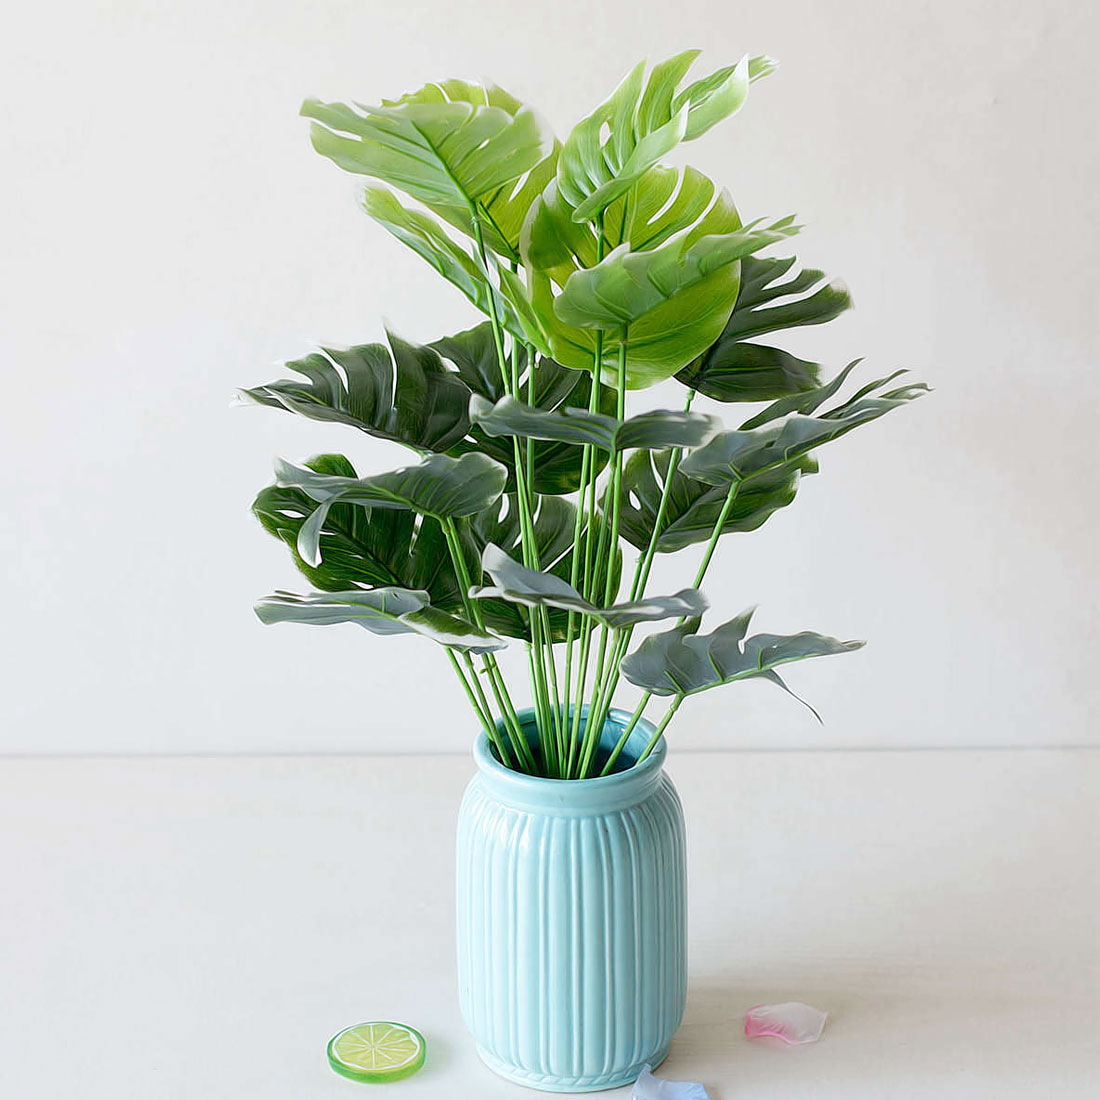 Home Decor Artificial Gr Plant